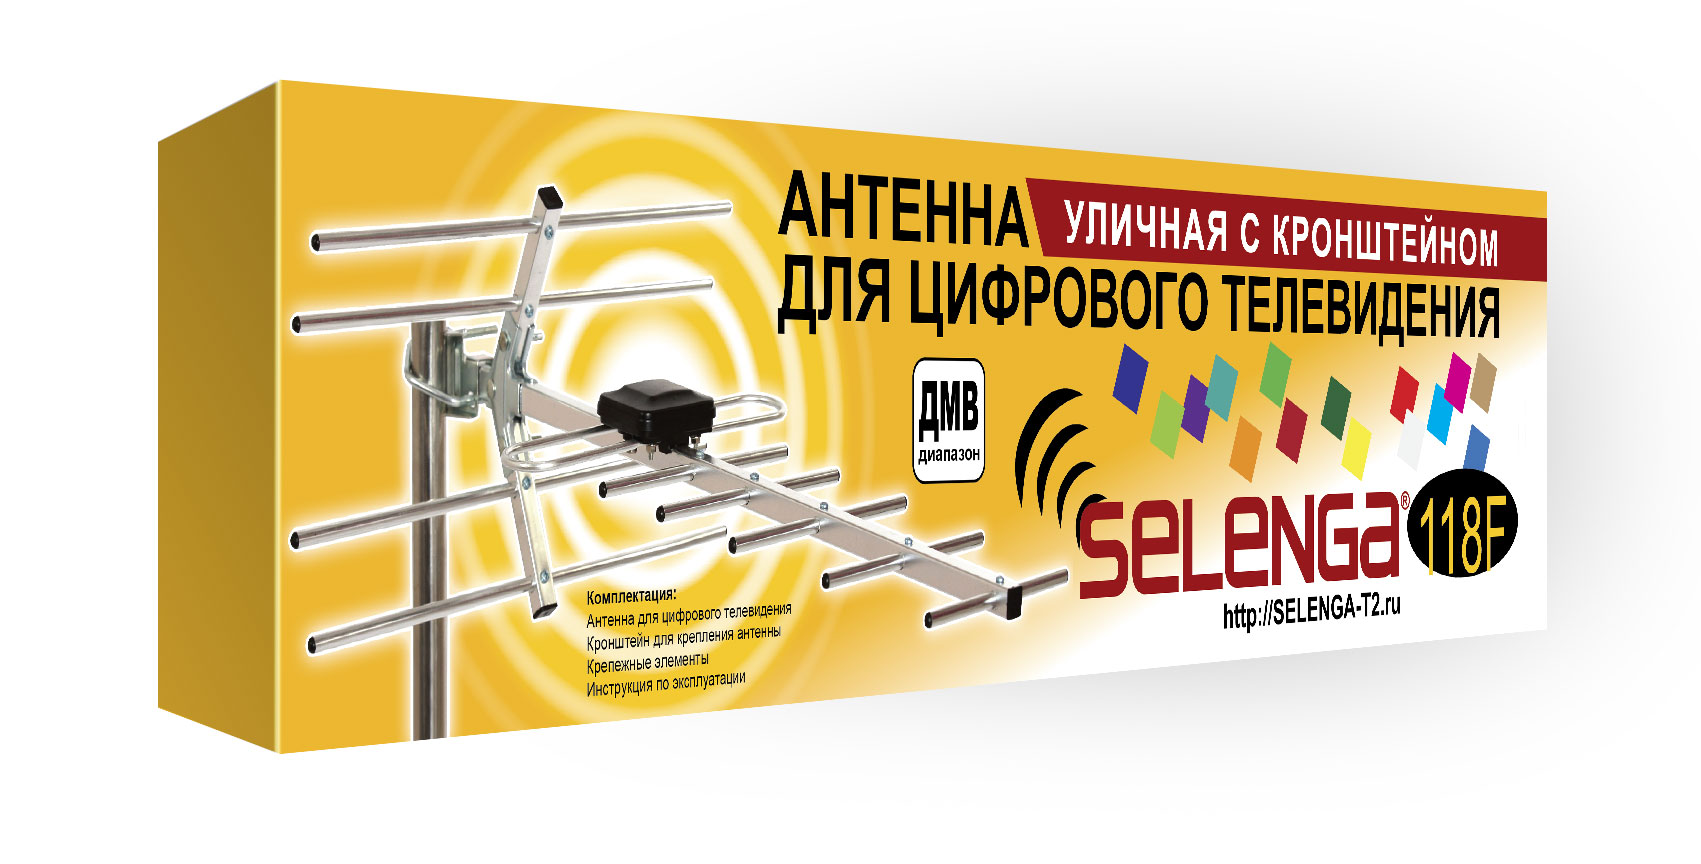 Уличная антенна для цифрового телевидения